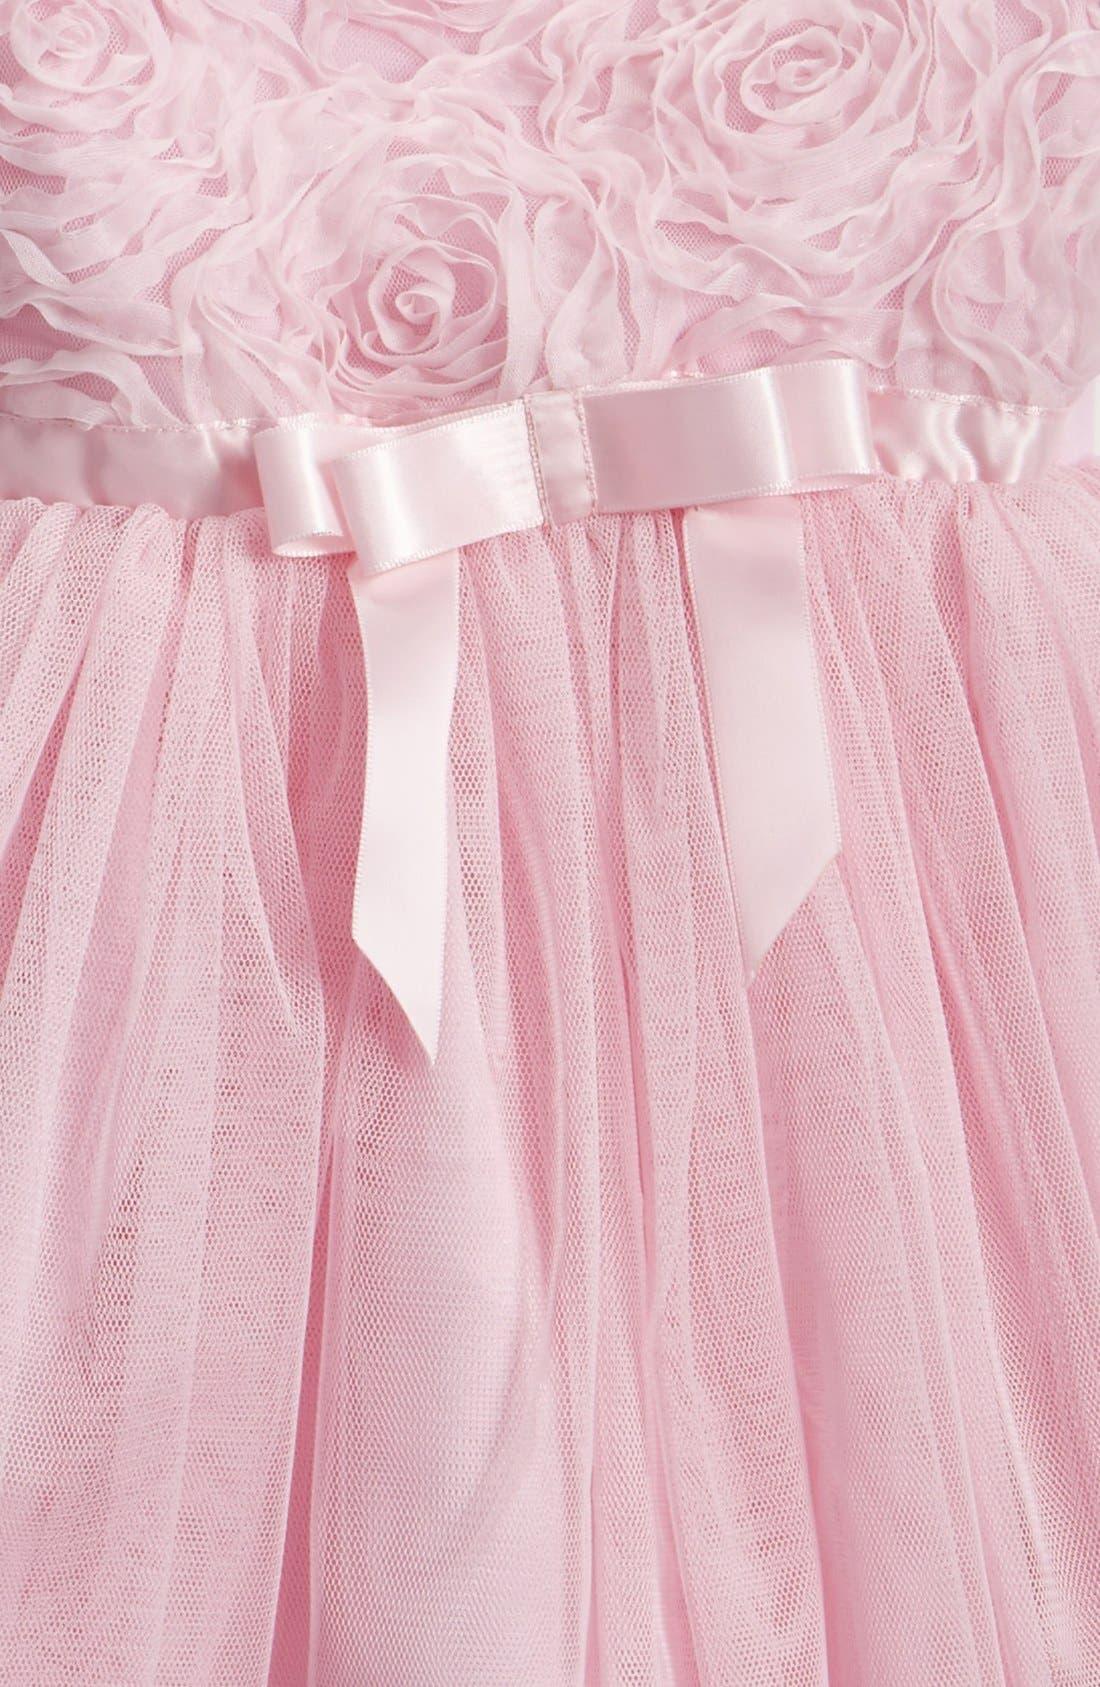 Short Sleeve Tulle Dress,                             Alternate thumbnail 3, color,                             PINK